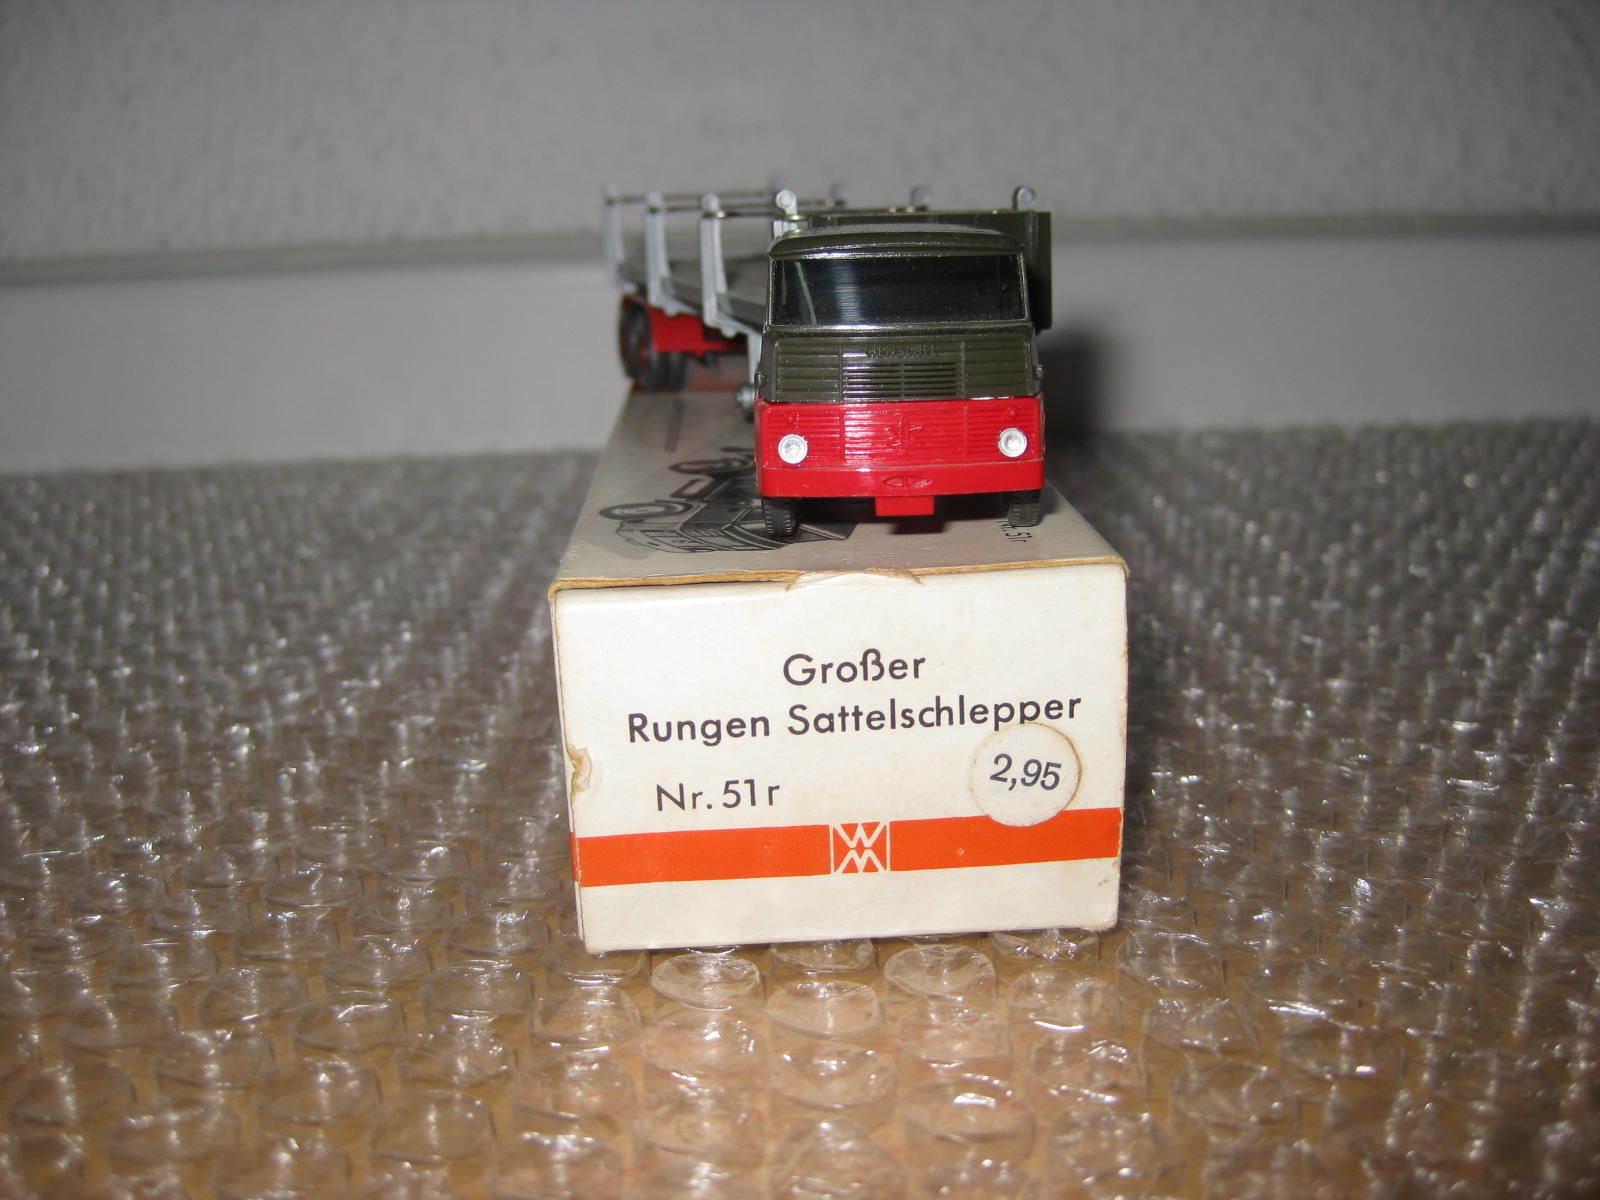 Wiking courirgensattelzug HENSCHEL  HS 14 in neuf dans sa boîte s28  vente en ligne